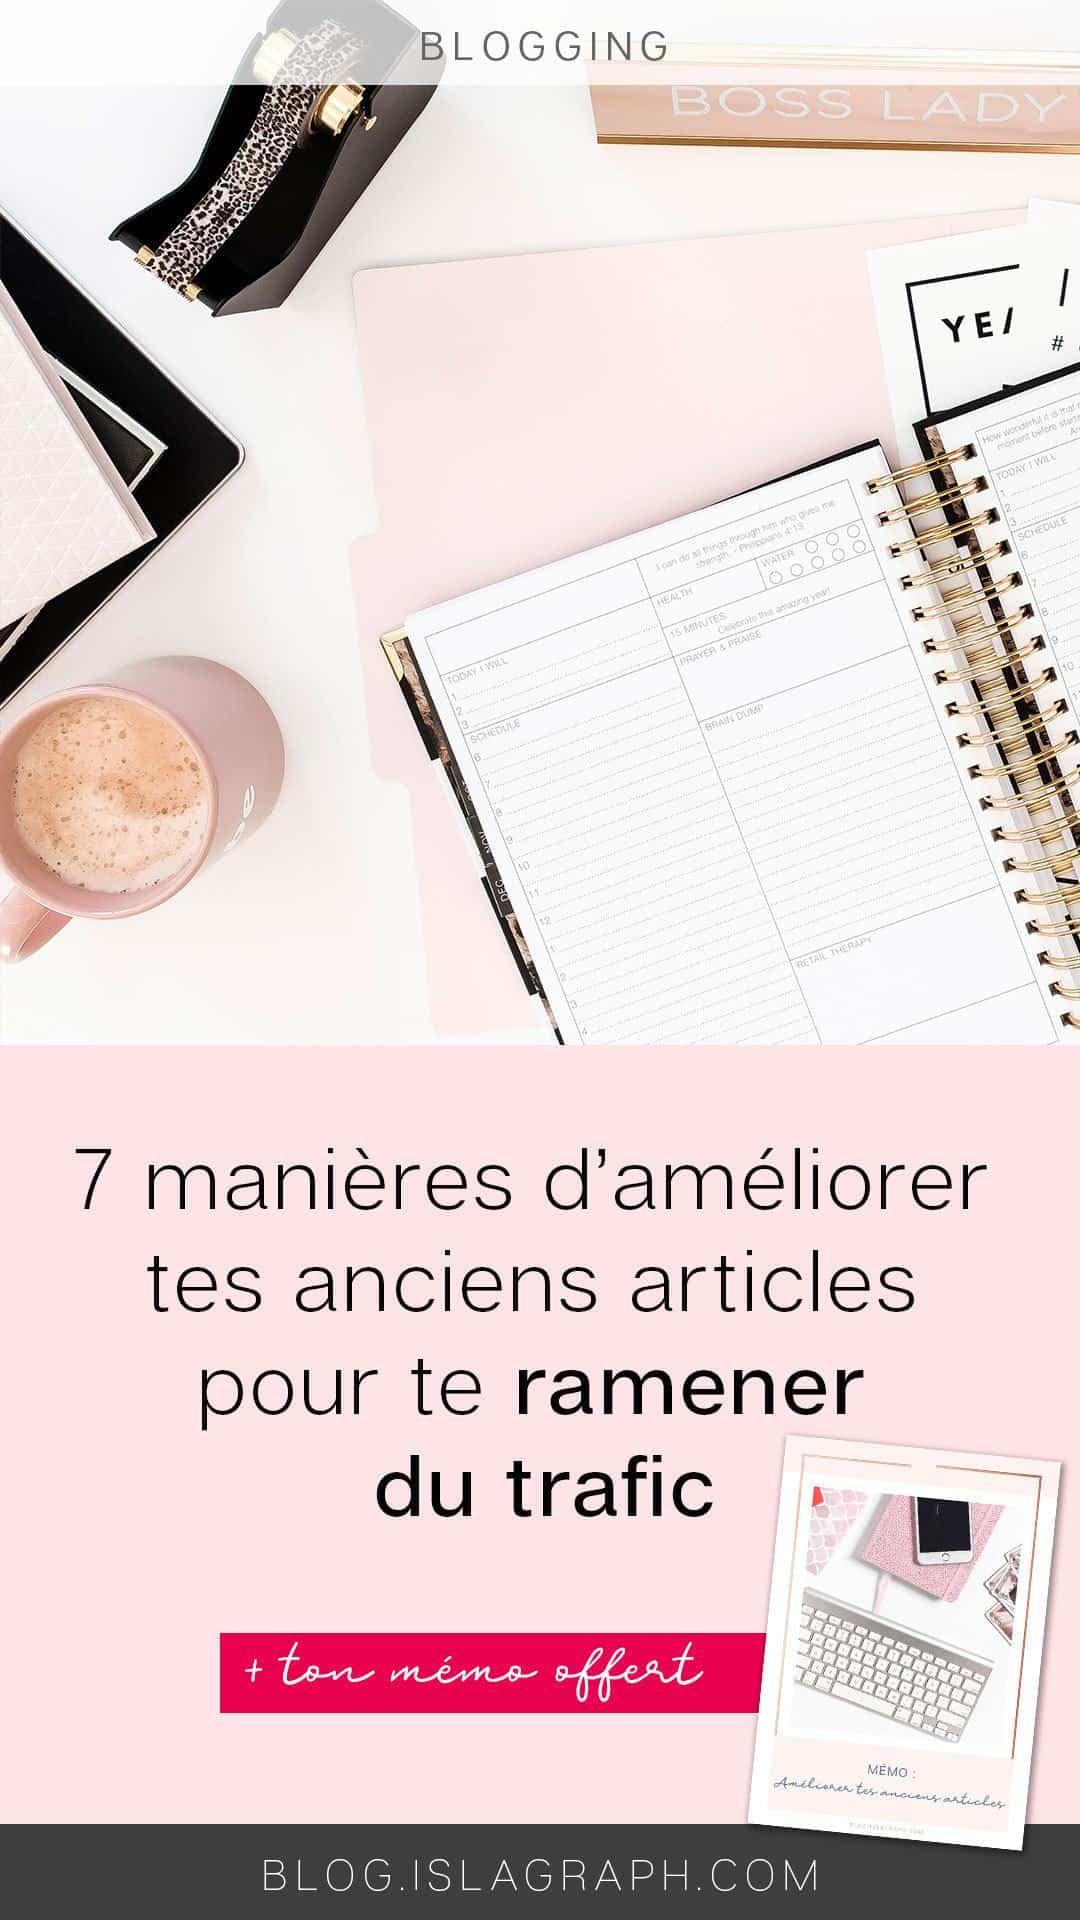 ameliorer_anciens_articles_blog